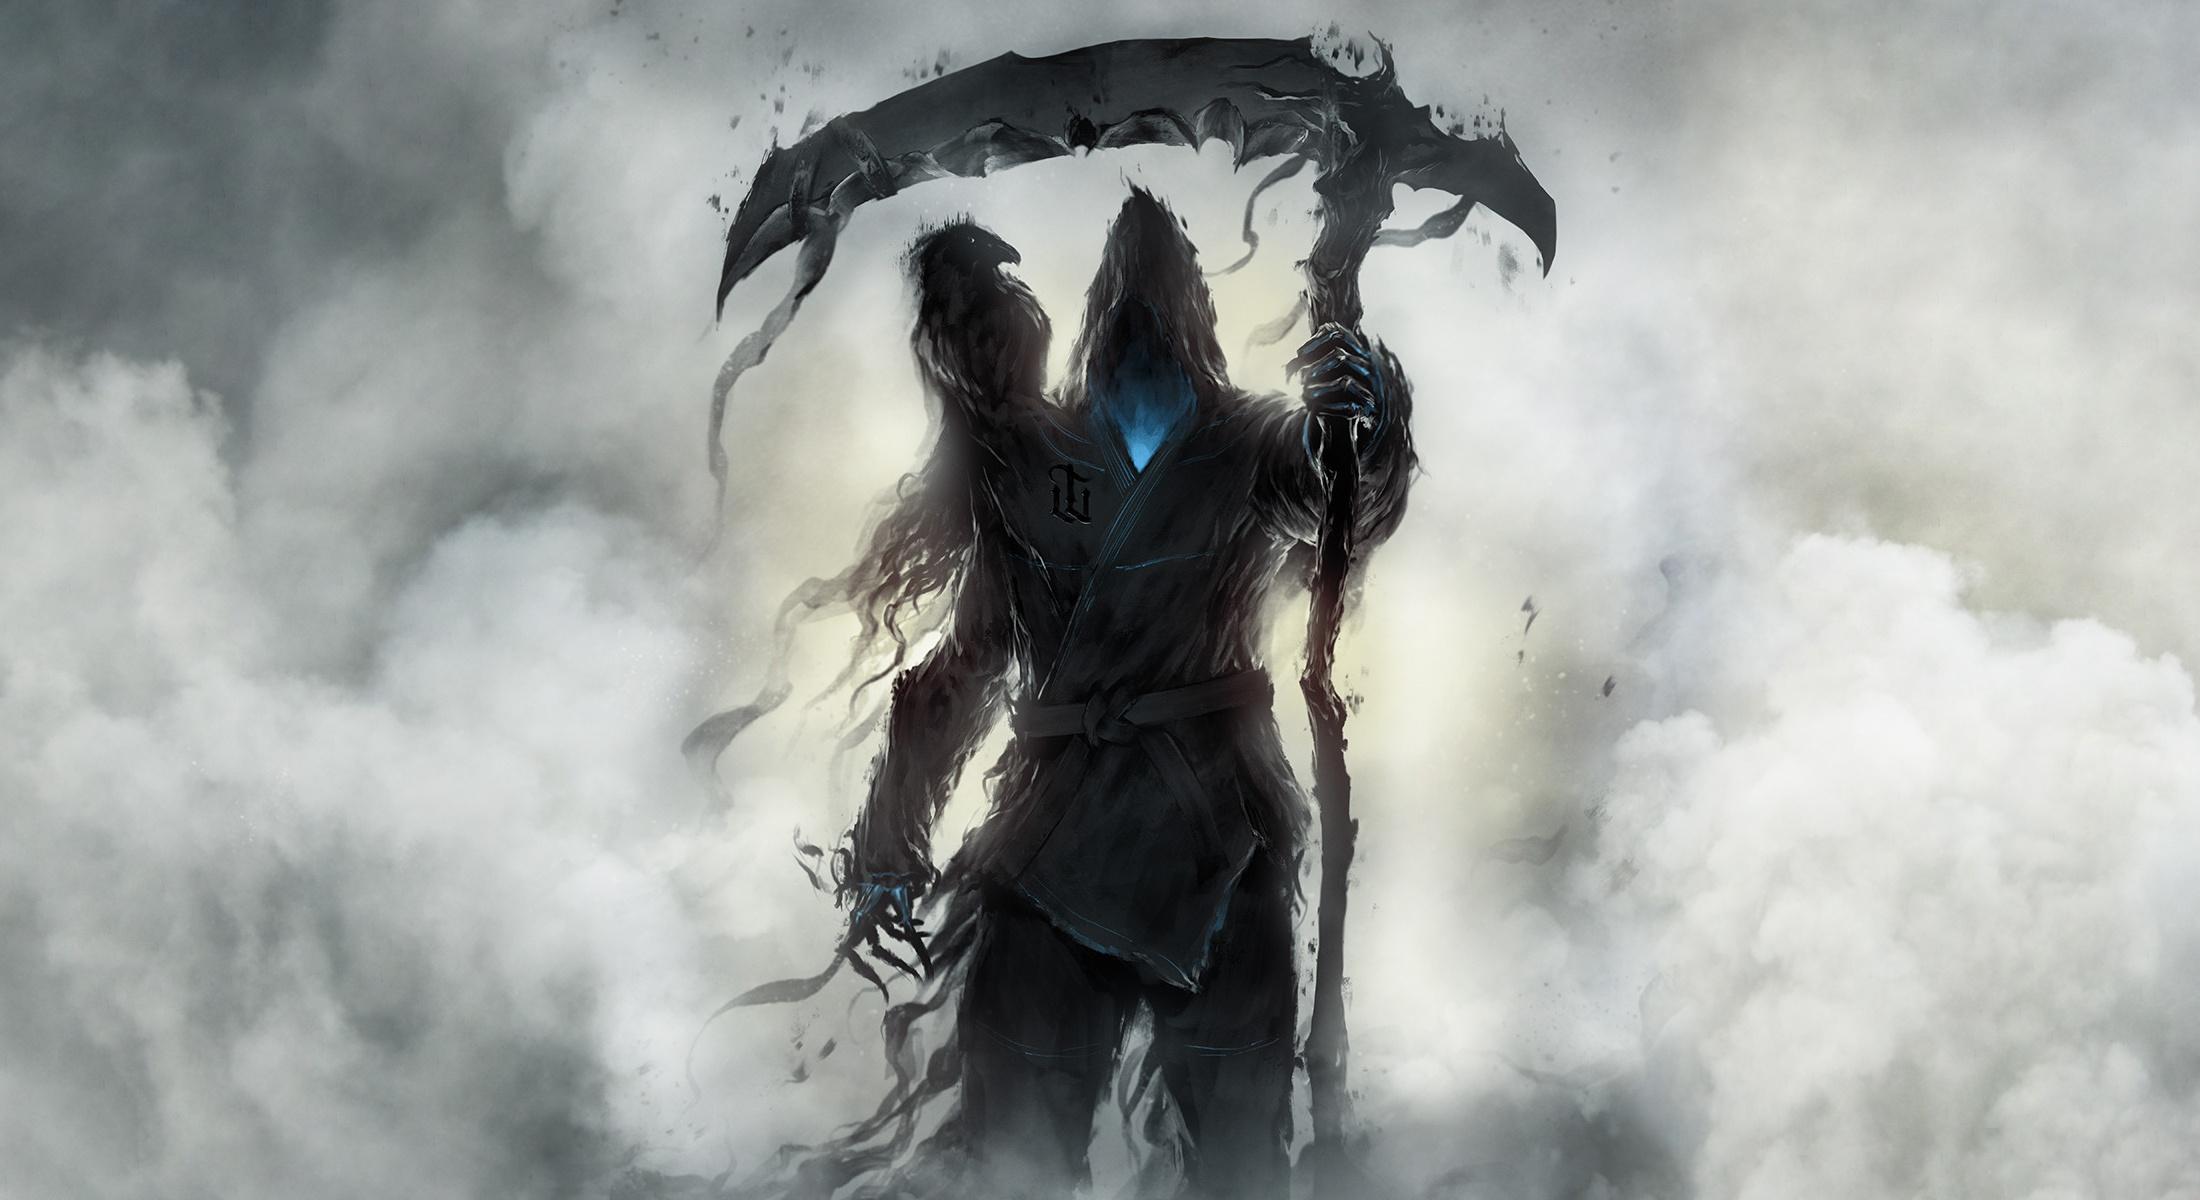 Grim Reaper HD Wallpaper | Background Image | 2200x1200 ...